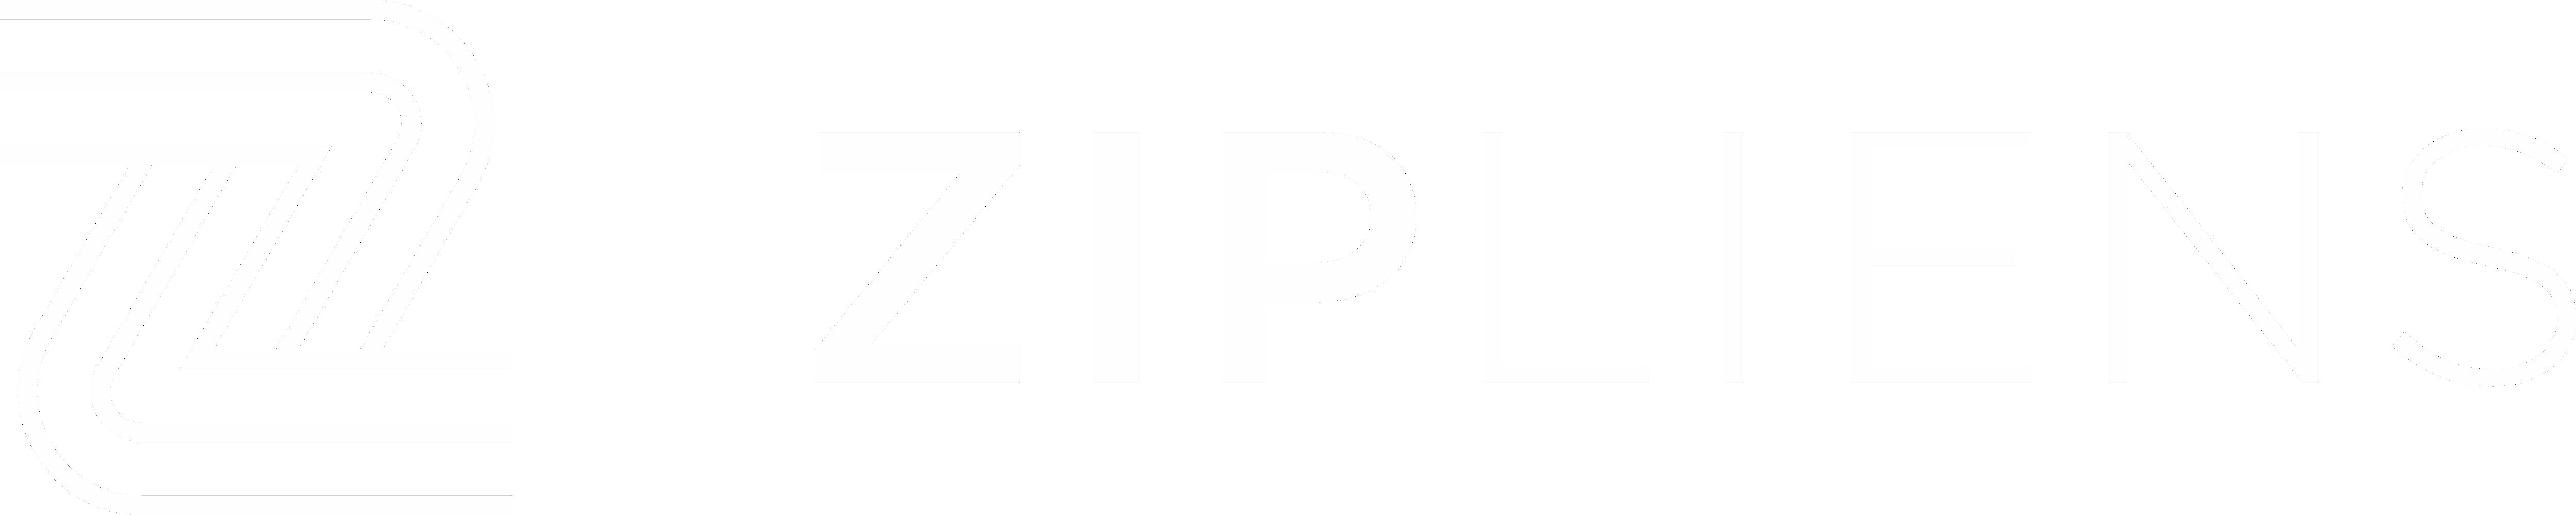 ZipLiens Logo